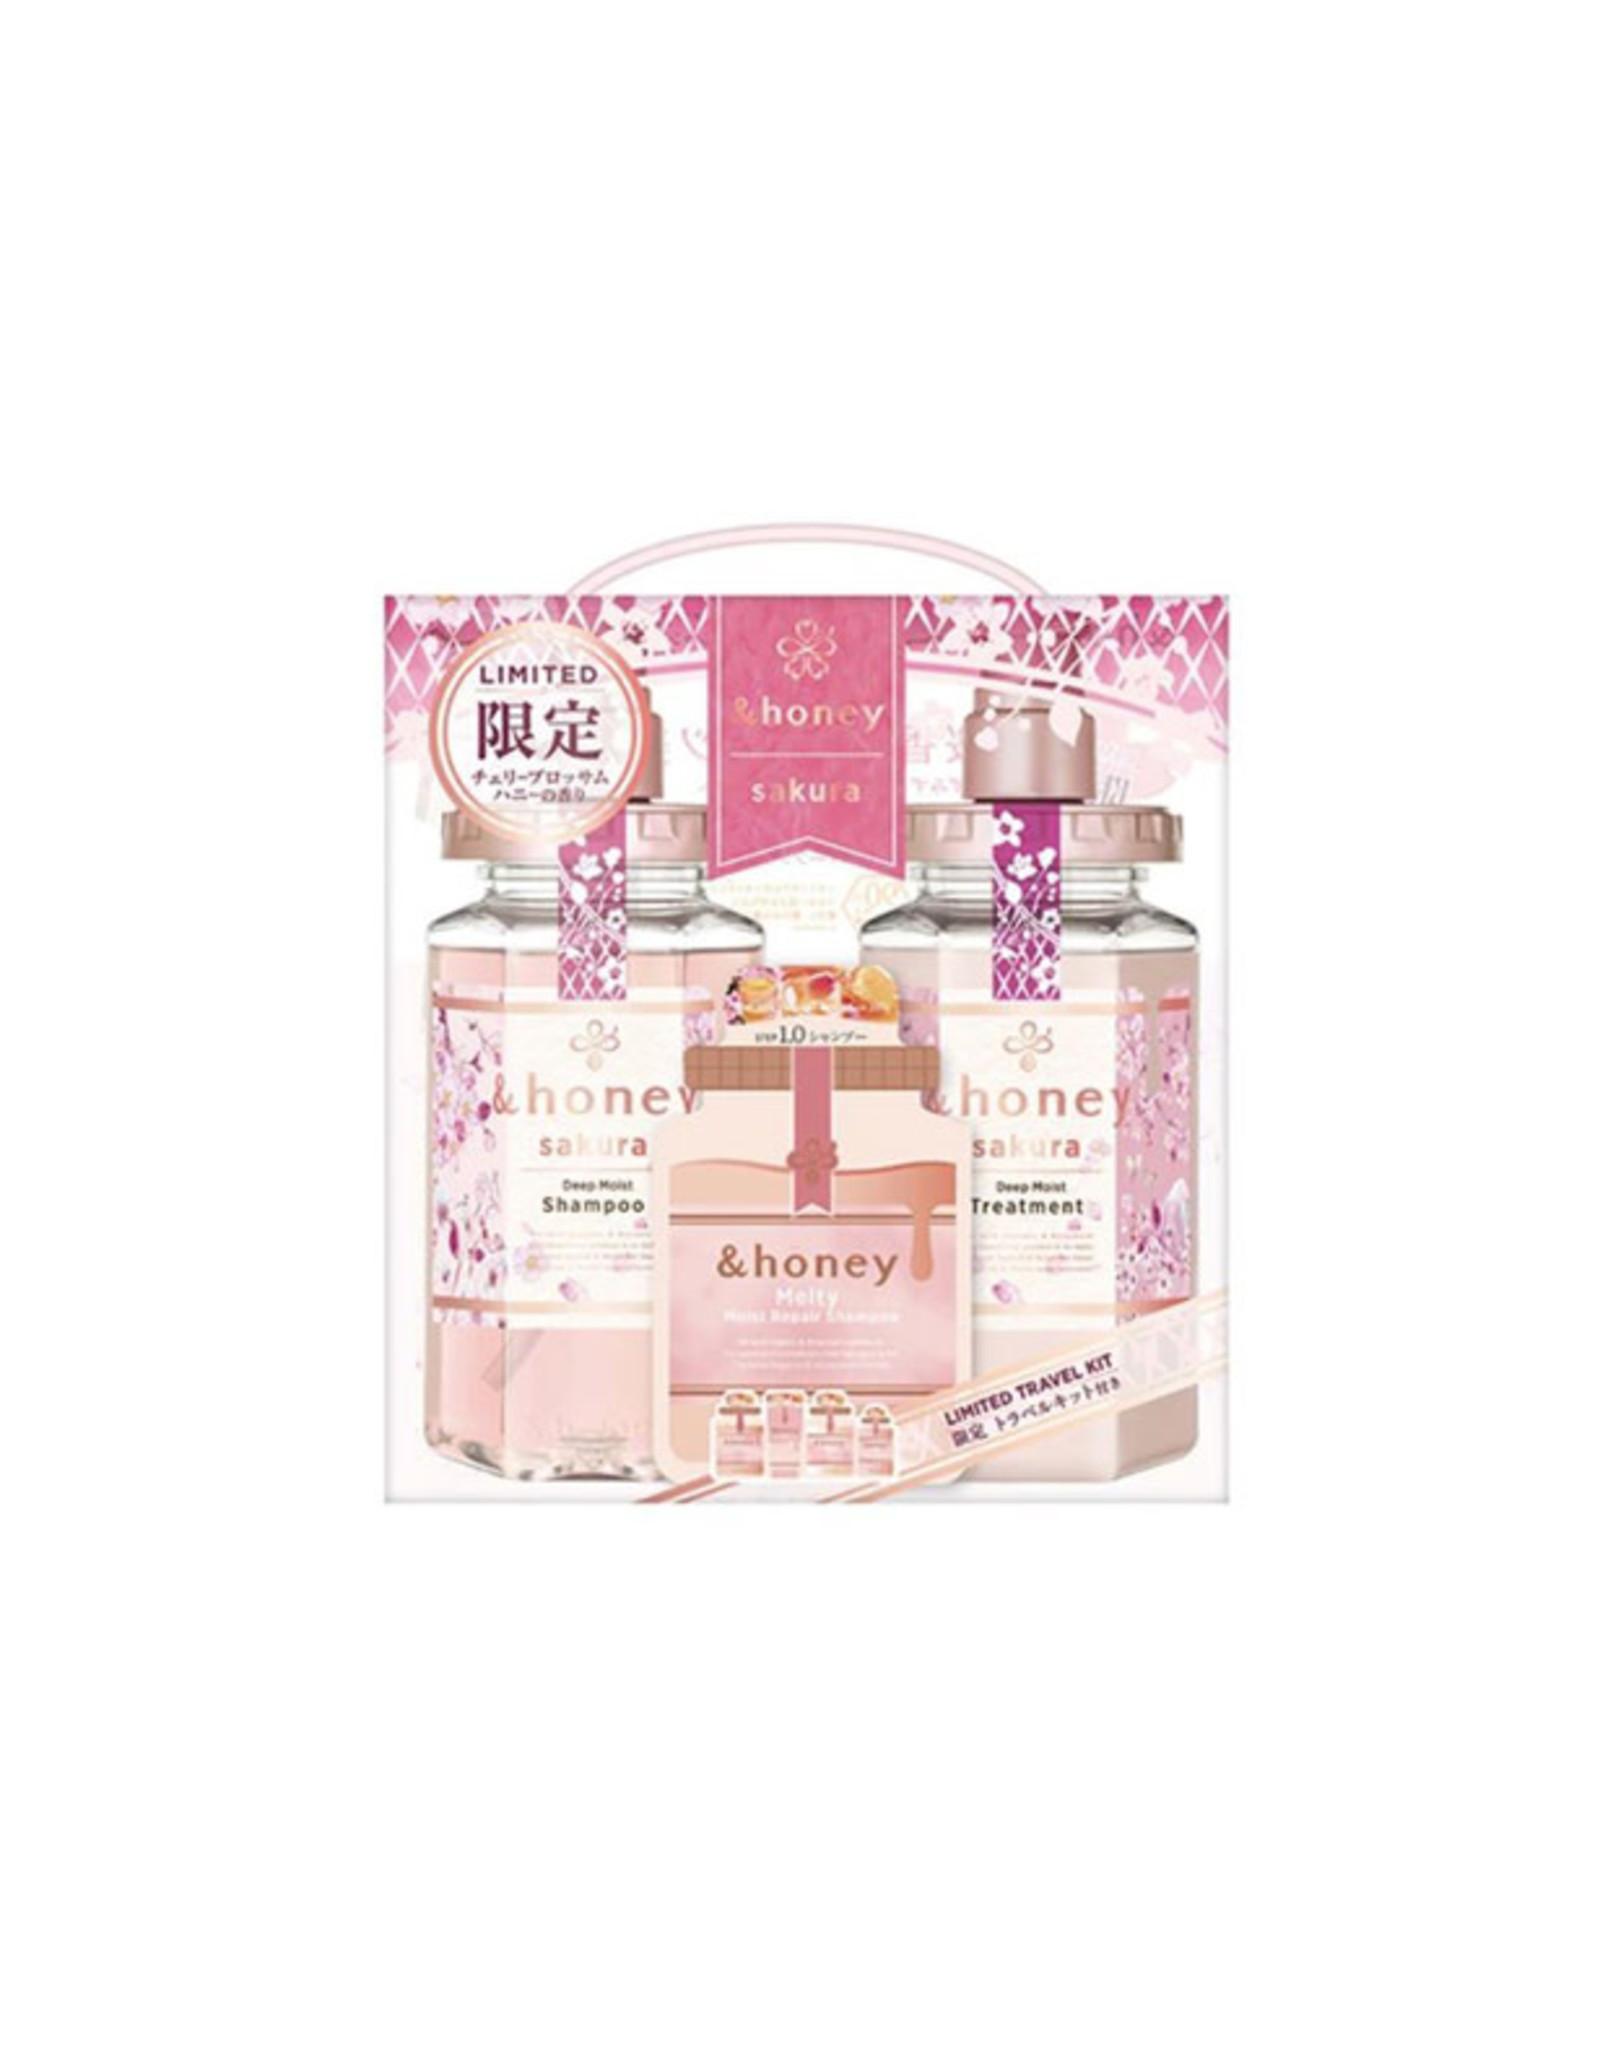 Vicrea Vicrea & Honey Deep Moist Sakura Limited Set